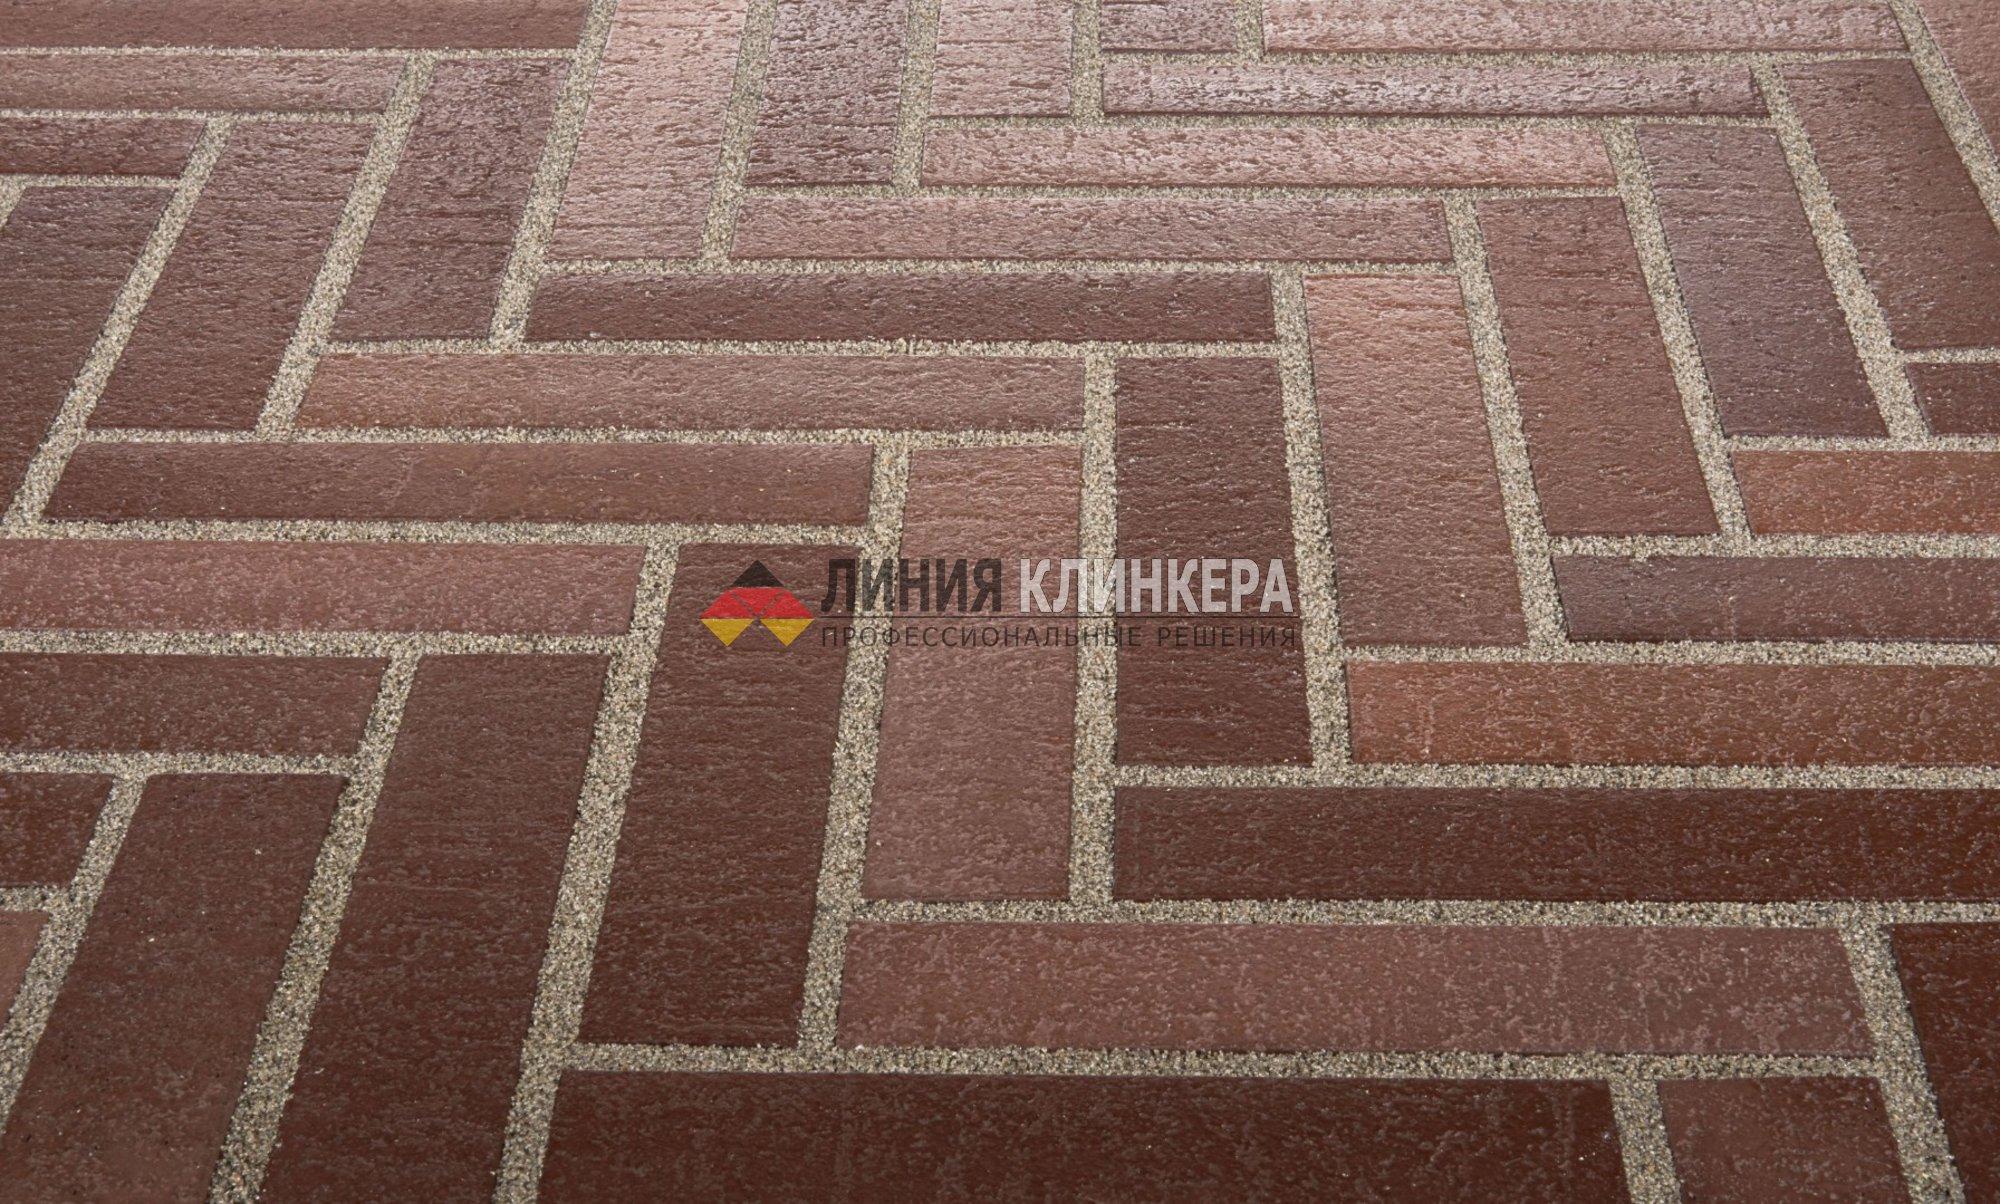 Тротуарная плитка ригель формат stroeher spaltklinker 3117